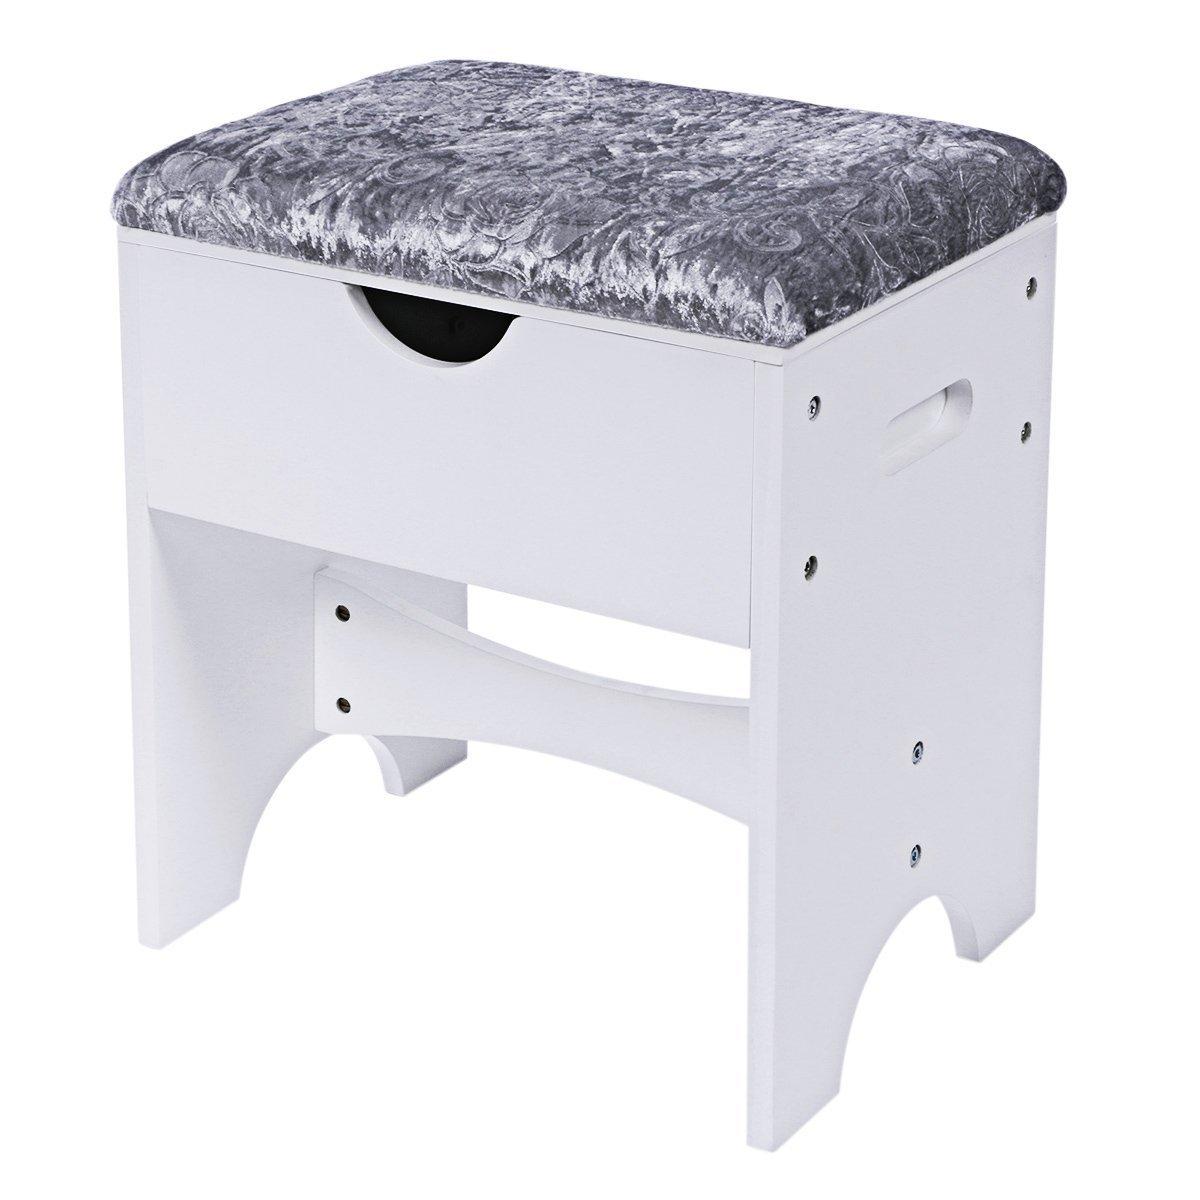 Bewishome Vanity Stool Piano Seat Makeup Bench Home